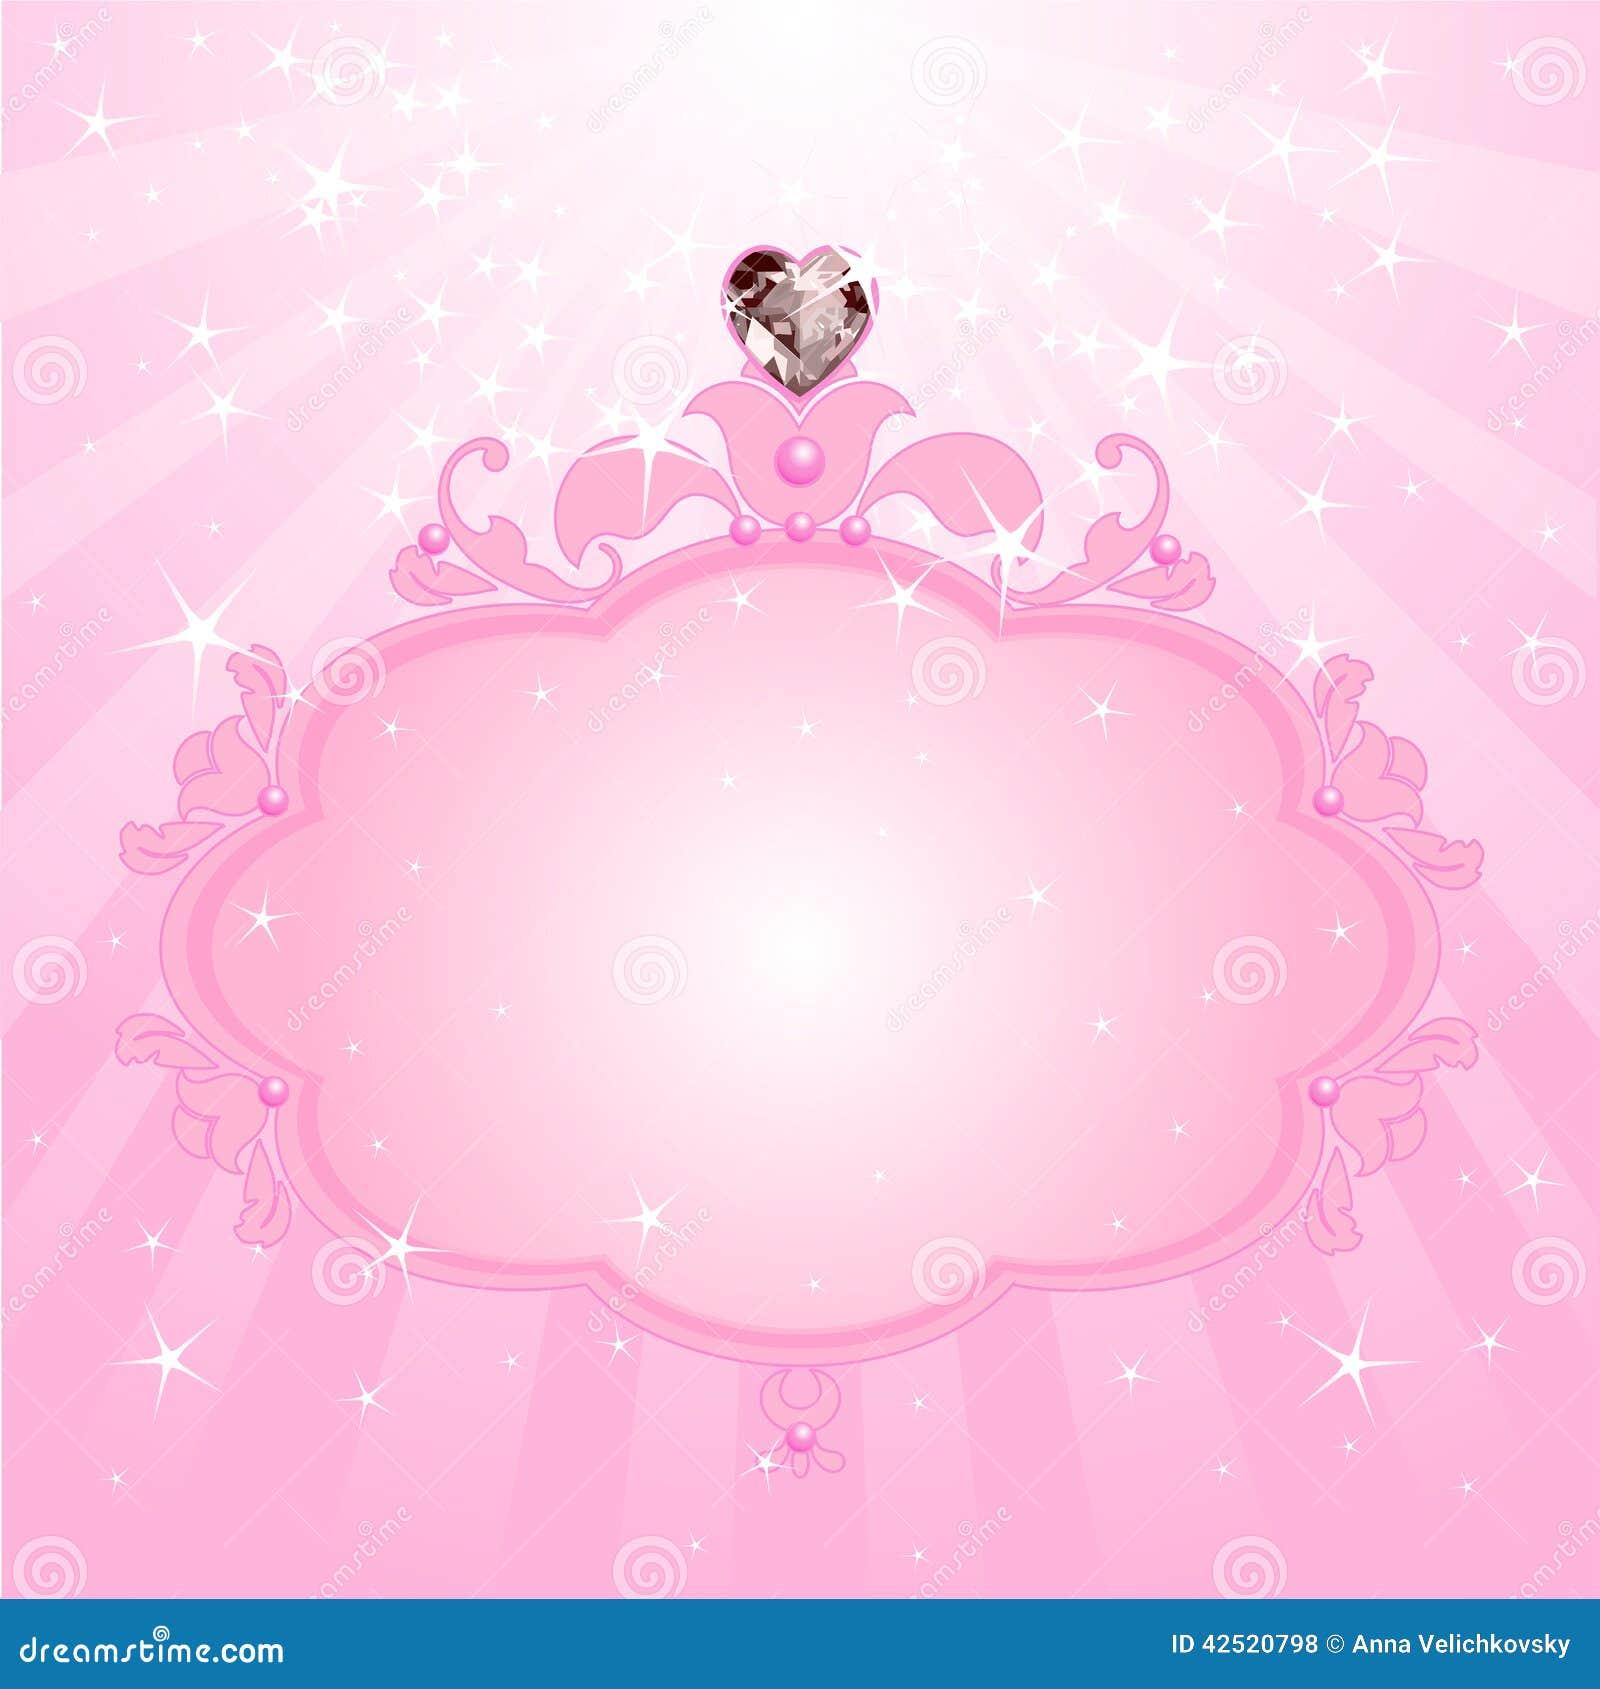 Princess pink frame stock vector. Illustration of clip - 42520798